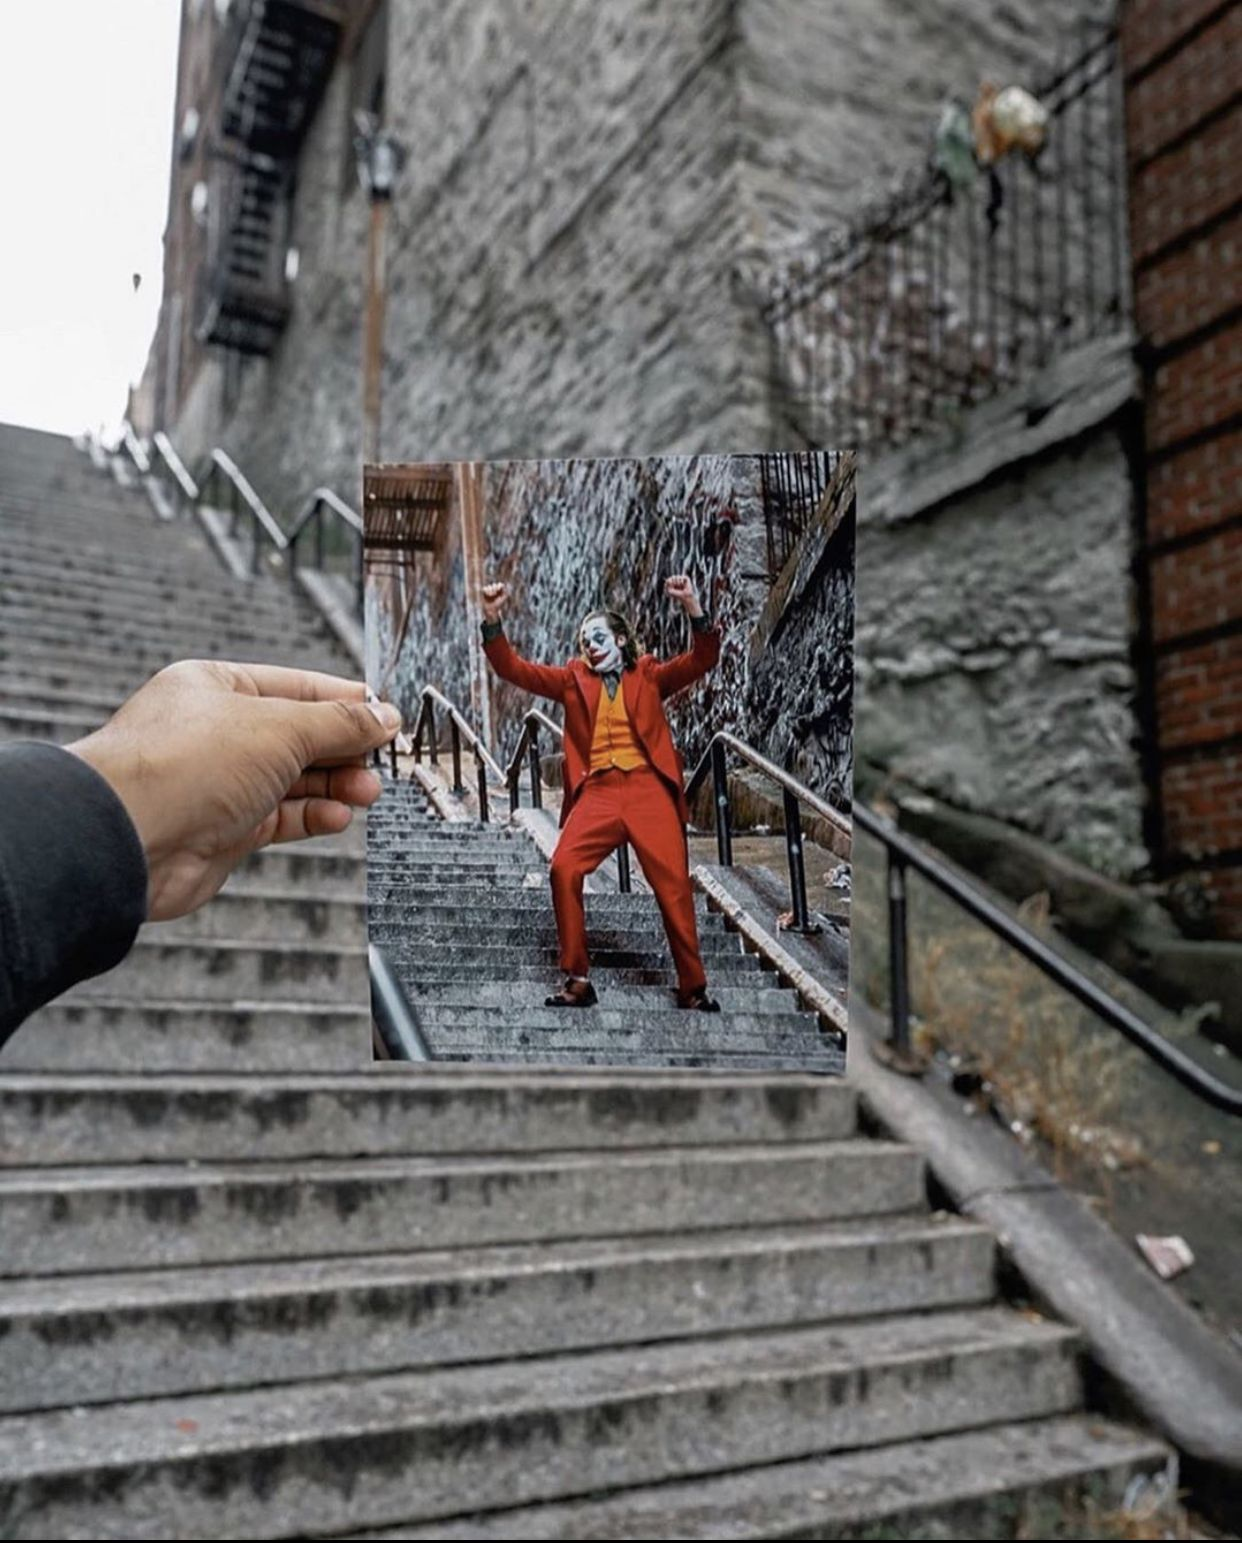 Pin by Nicholas Richmond on Joker (2019) Joker images